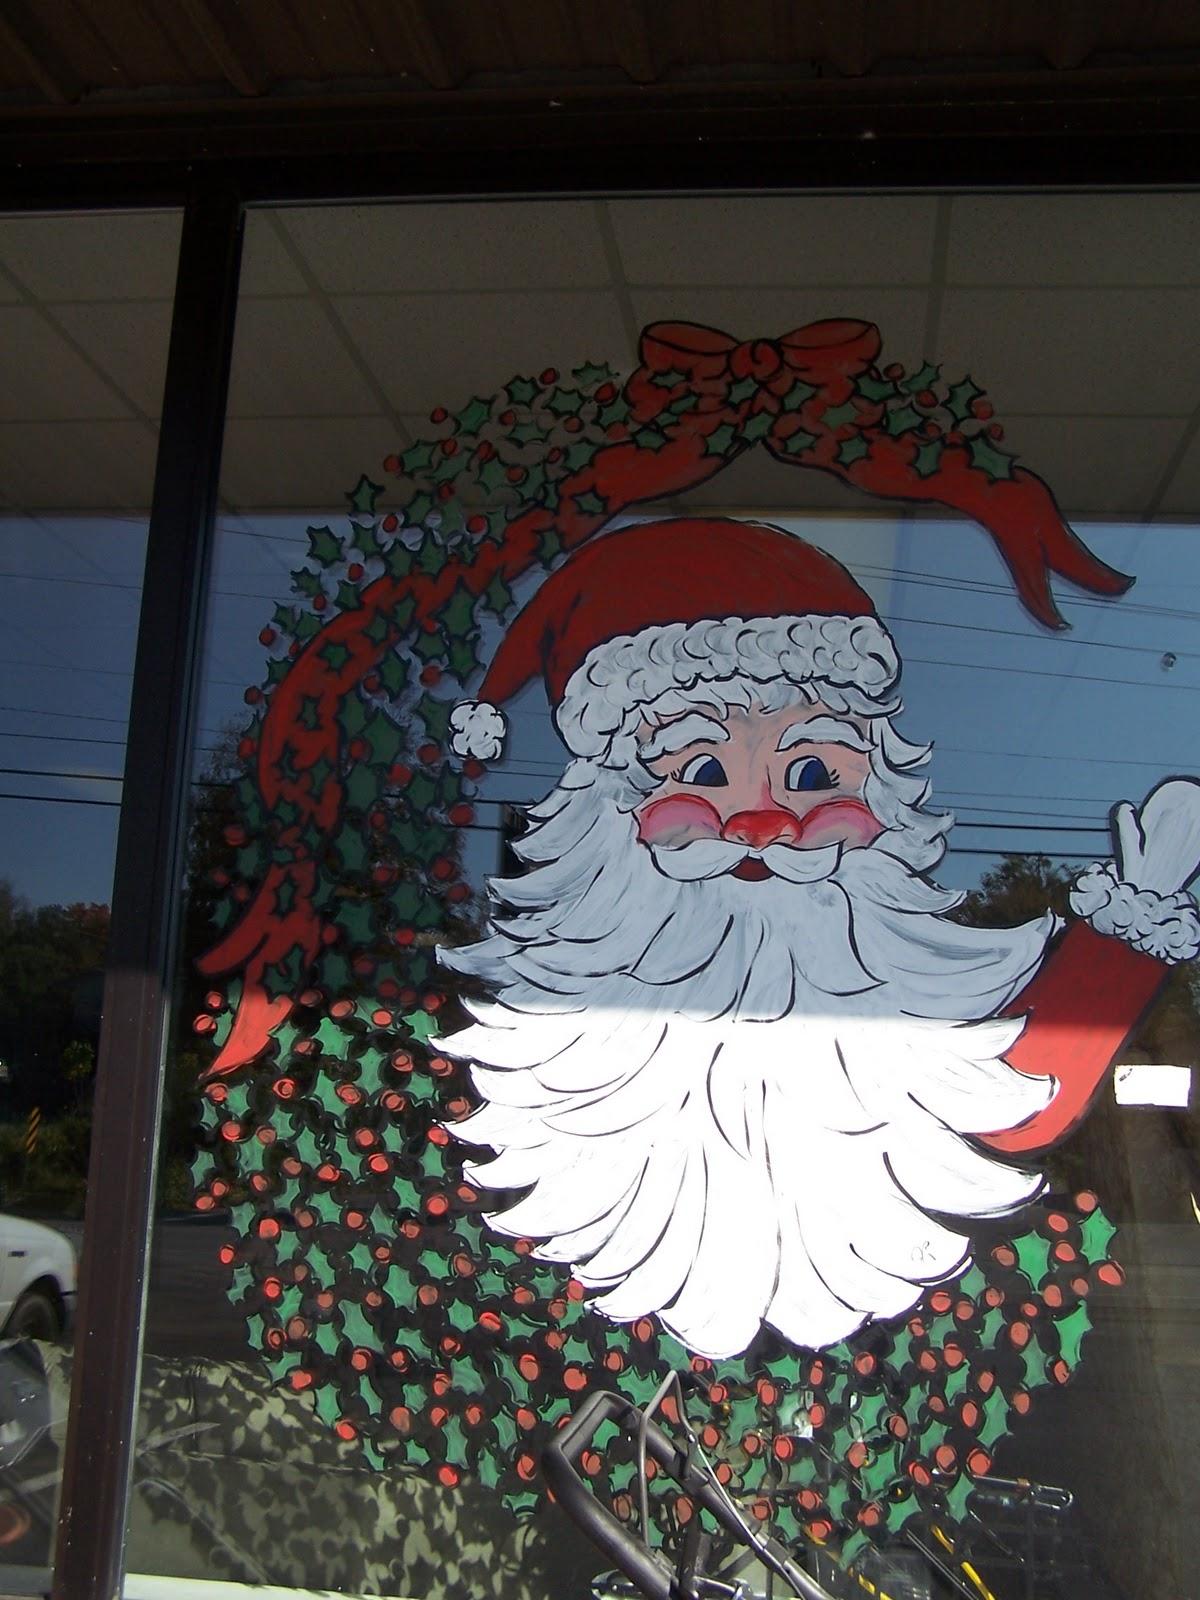 Paintings Scenes Through Windows Paint The Christmas Scenes